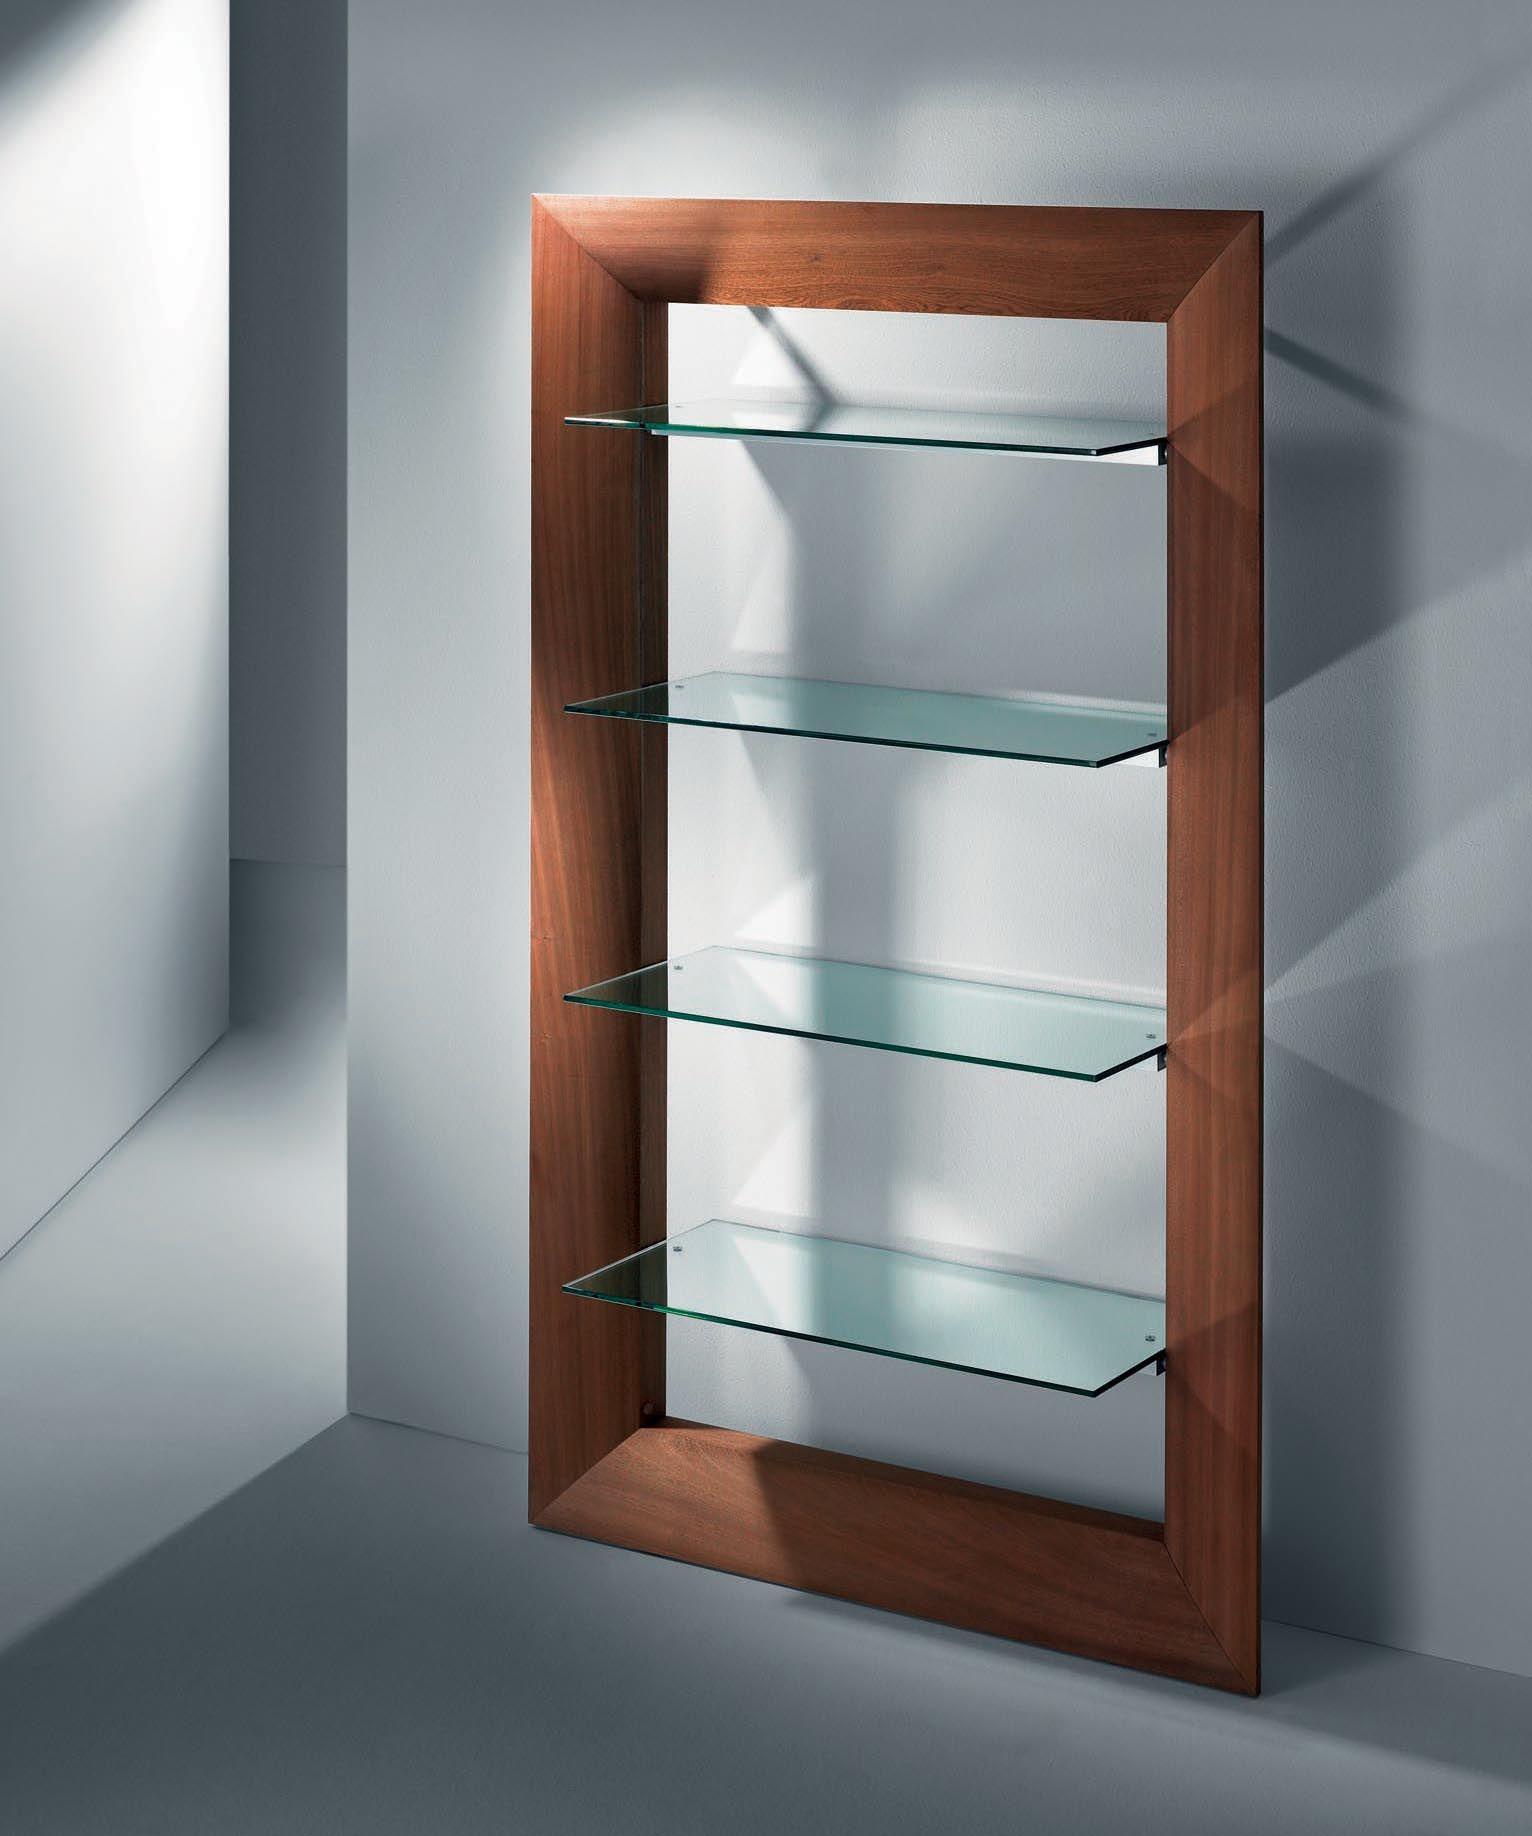 Biblioth que frame miroir acajou driade for Miroir acajou